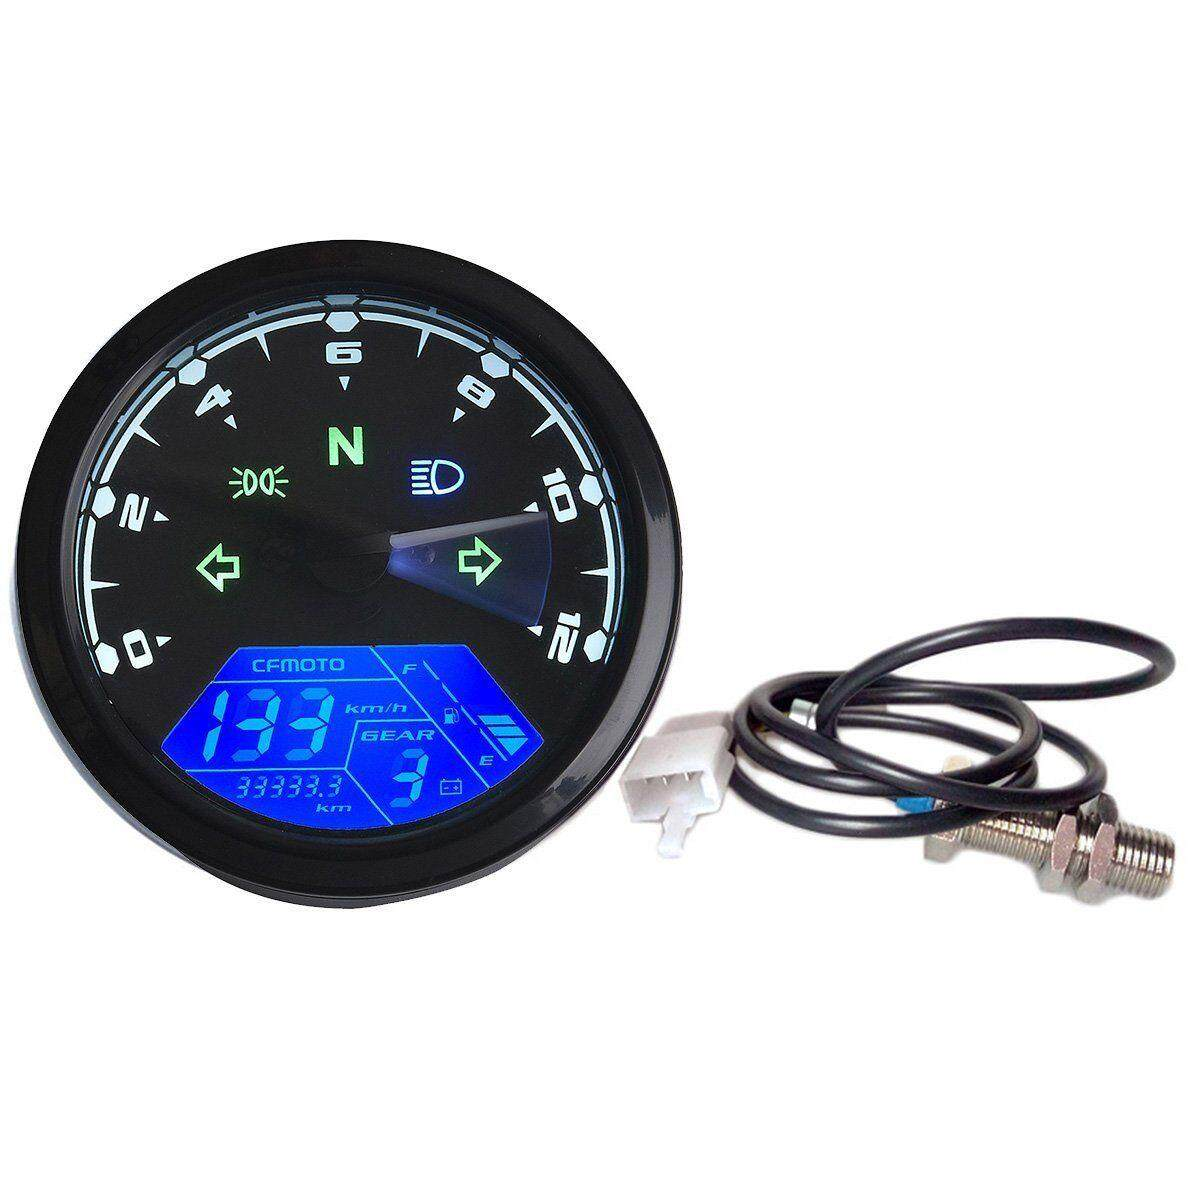 beautymaker 12000RPM KMH/MPH LCD Digital Gauge Motorcycle Speedometer  Odometer Motor Bike